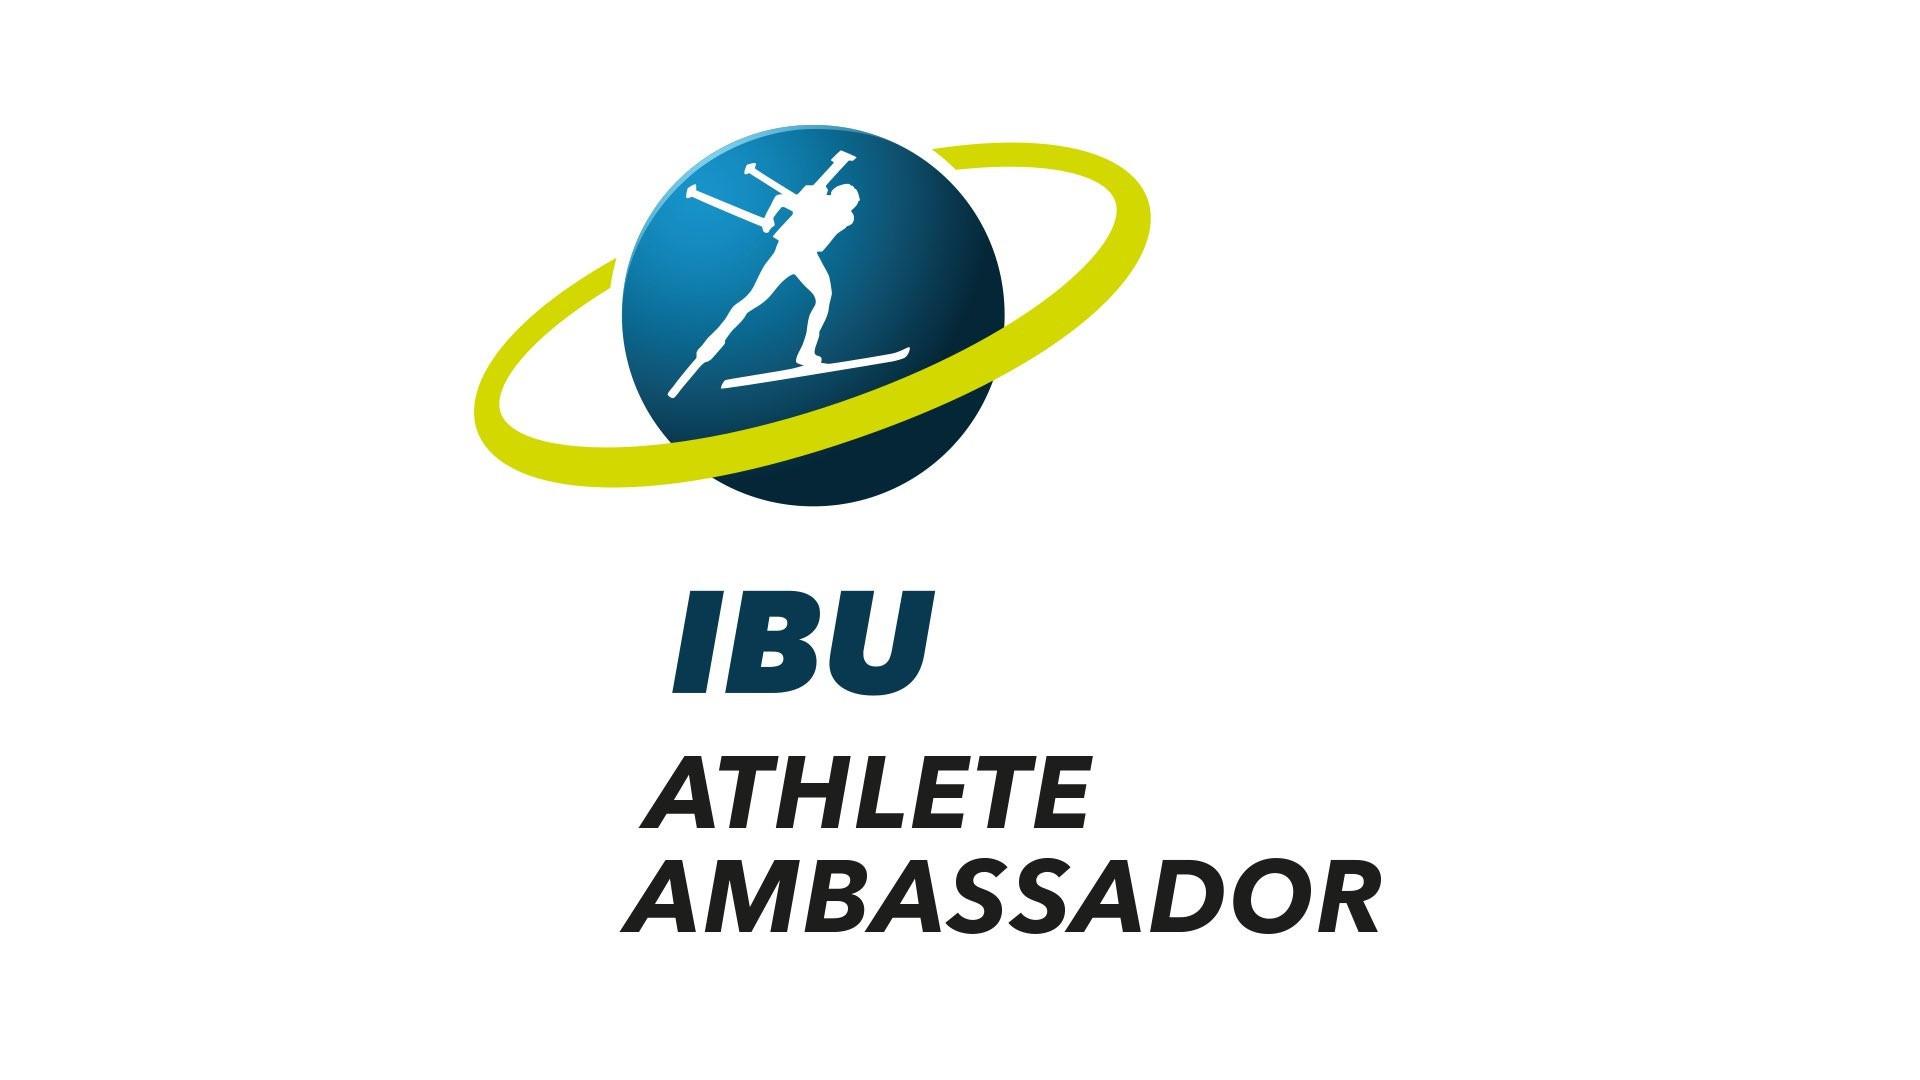 Samuelsson among 15 athlete ambassadors as IBU launches new programme